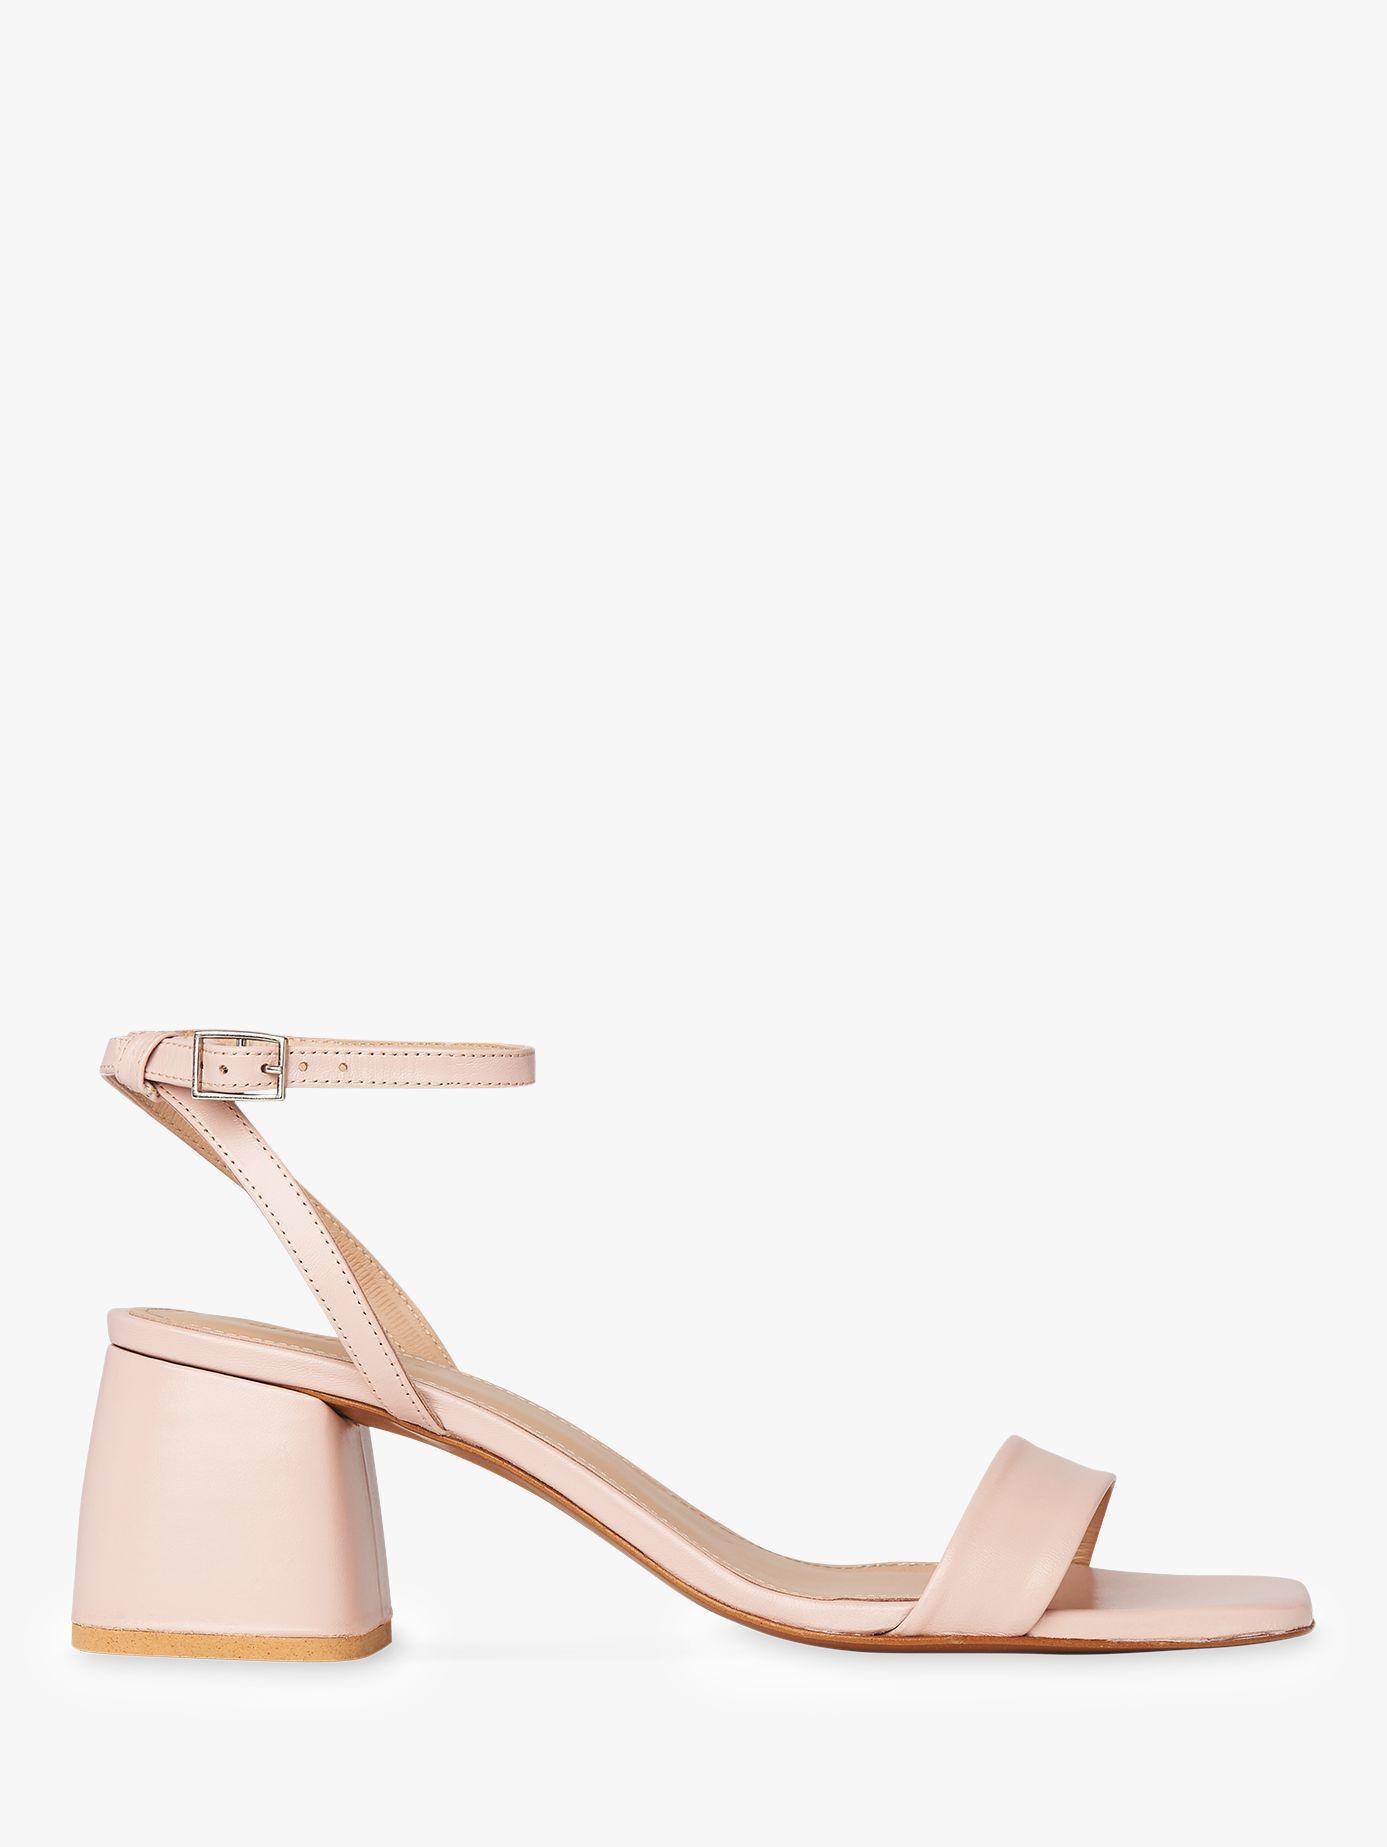 b047304dec86 Whistles. Women s Pink Hale Block Heel Sandals. £139 From John Lewis and  Partners